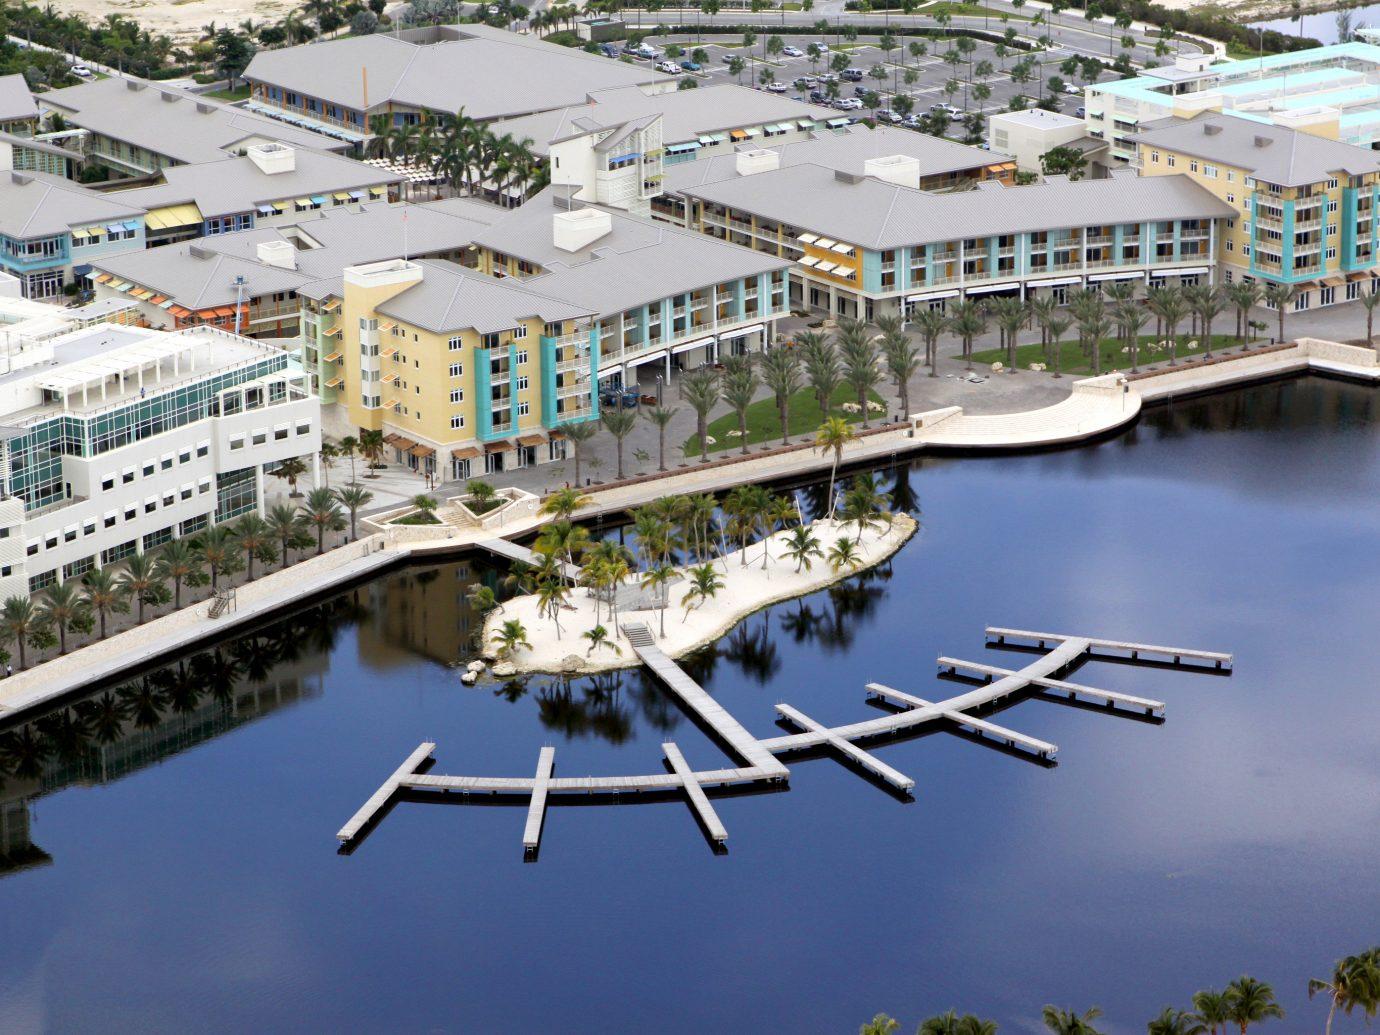 Trip Ideas marina outdoor dock aerial photography bird's eye view residential area bridge River cityscape reflection urban design port